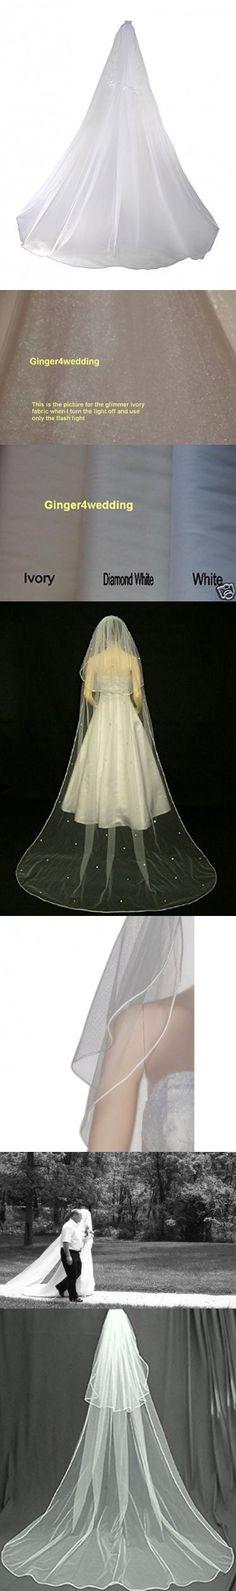 Shop Ginger Wedding Glimmer Diamond White 2 Tier Cathedral Swarovski Crystal Bridal Veil